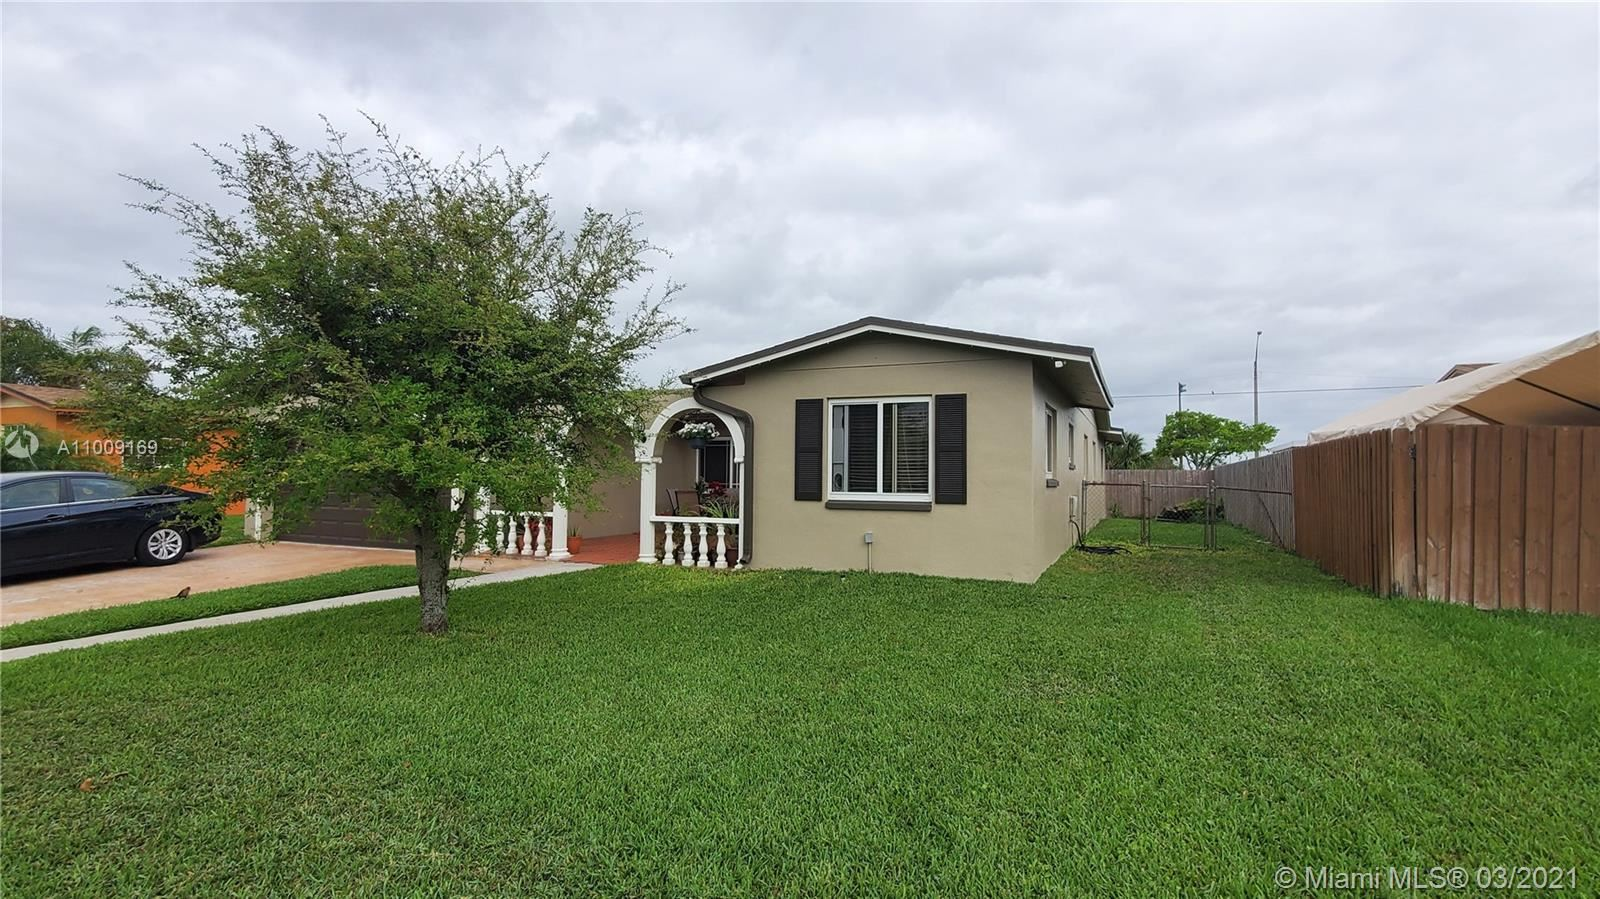 Photo of 9361 NW 24th Pl, Pembroke Pines, FL 33024 (MLS # A11009169)